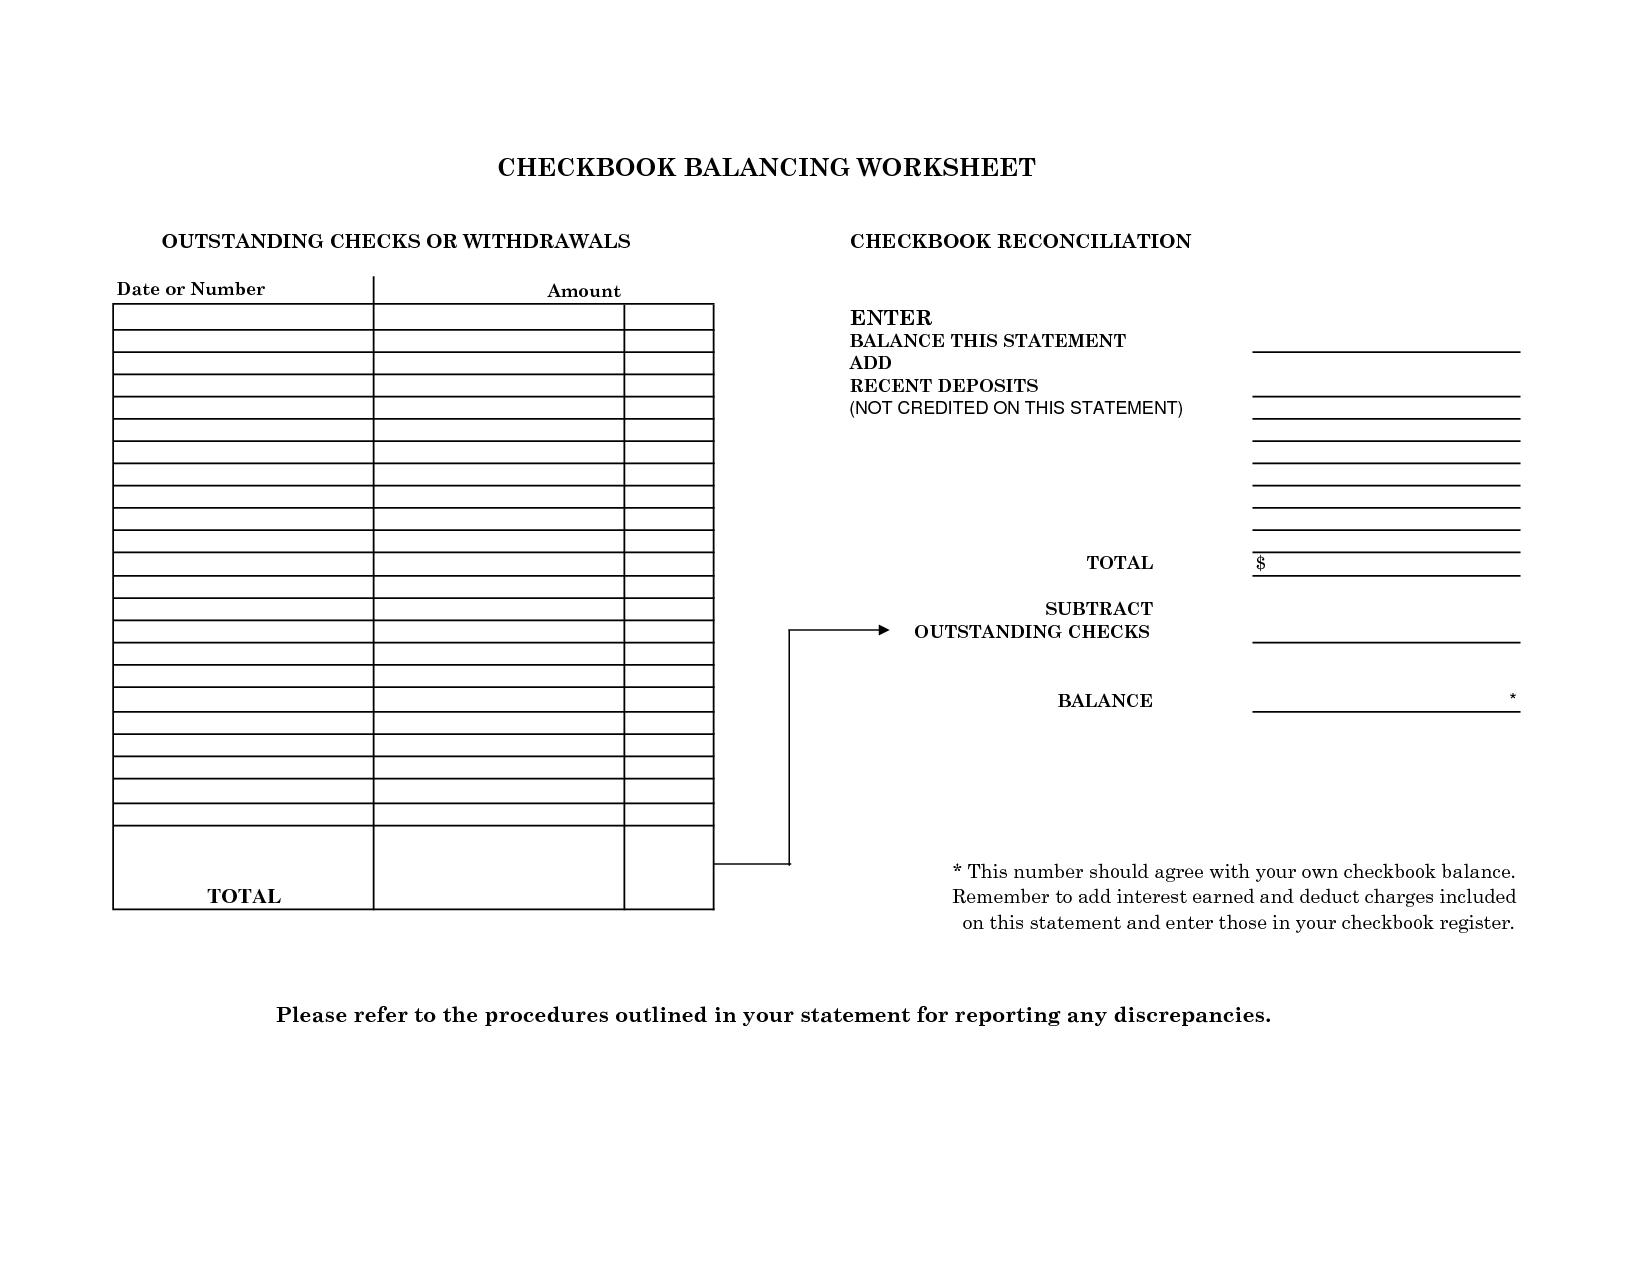 Checkbook Reconciliation Practice Worksheets Best Photos